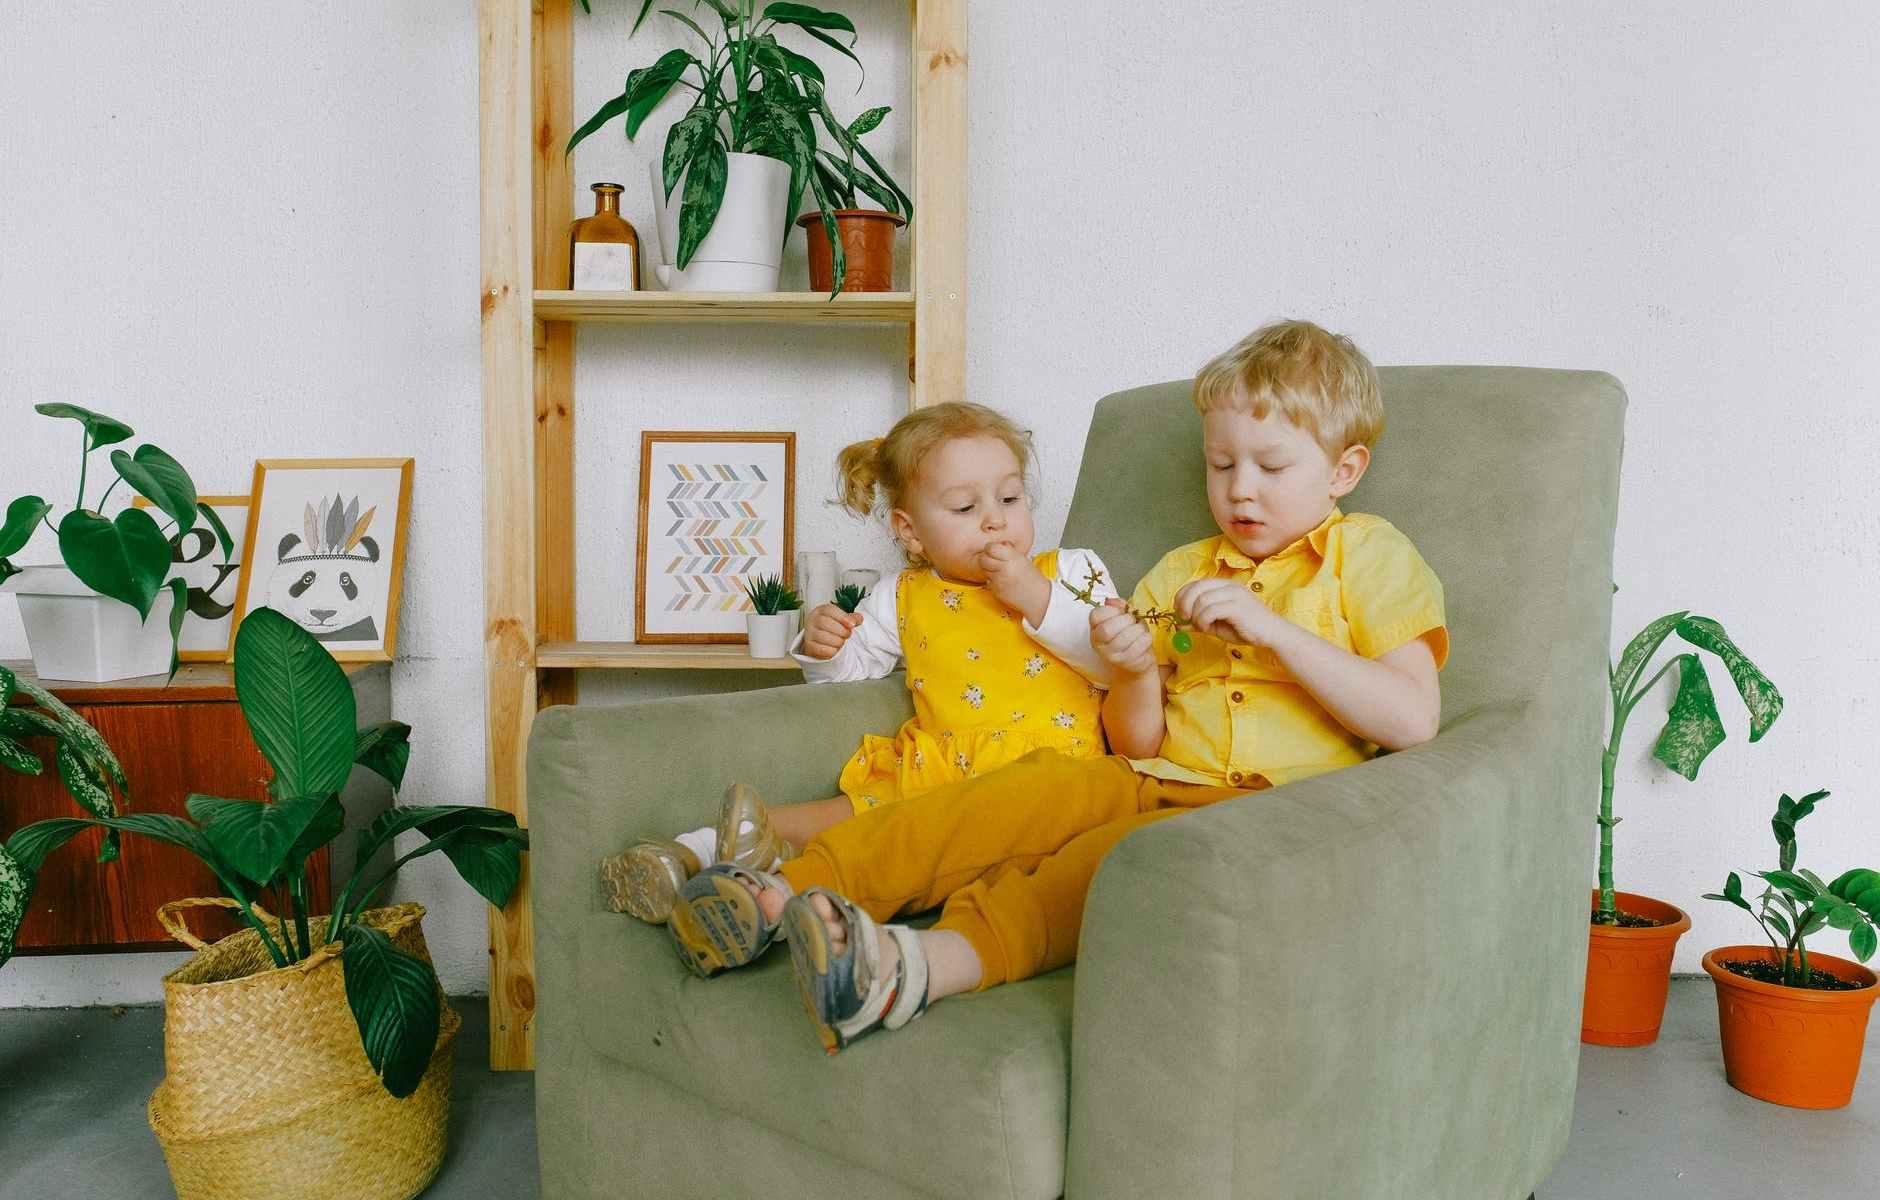 a photo of siblings eating grapes